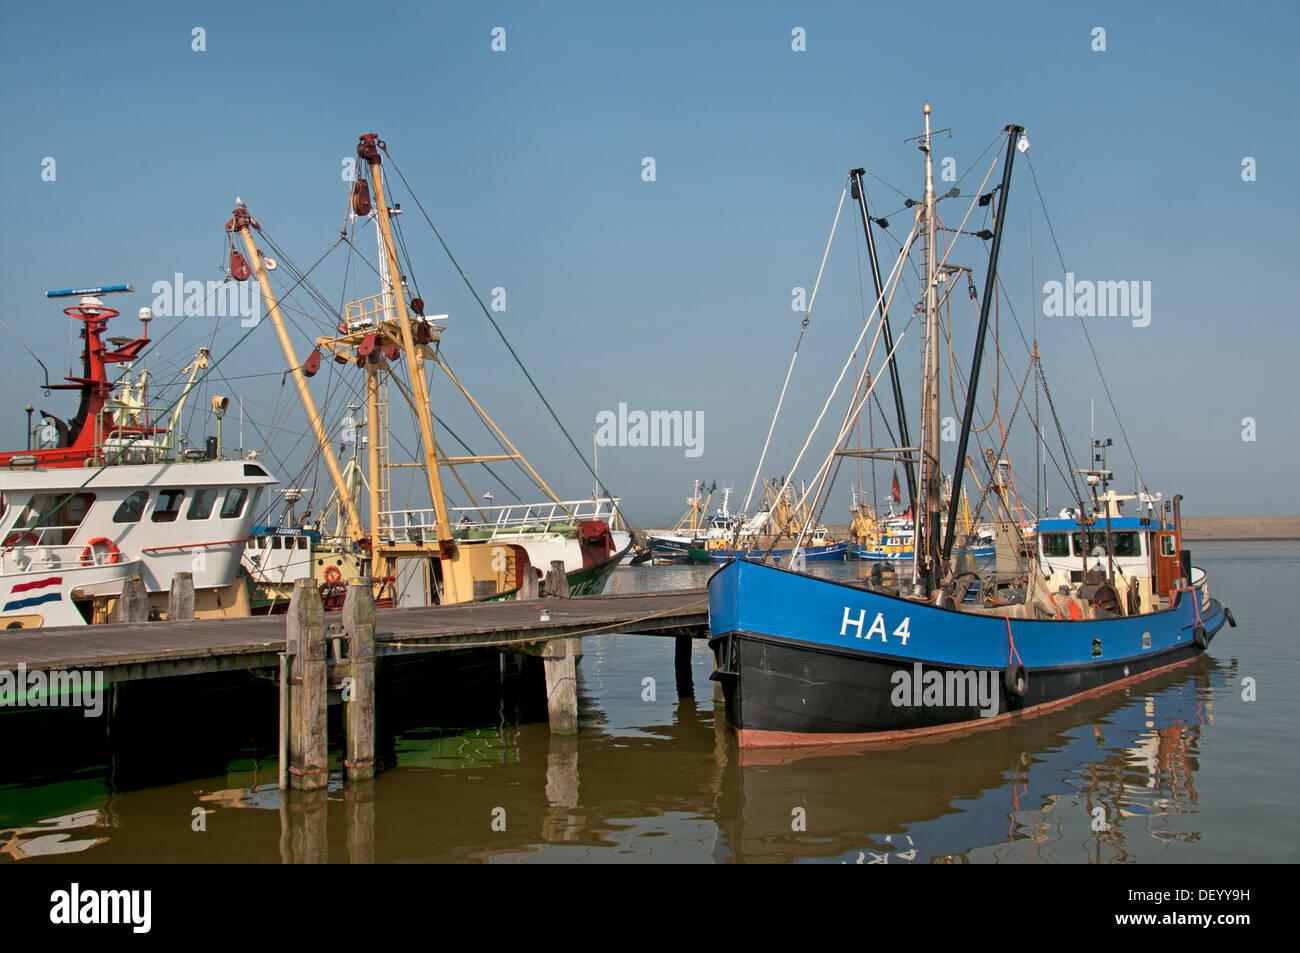 Harlingen Fishing port with a fish auction function and a home port for Harlingen en Urker cutters Netherlands Friesland - Stock Image